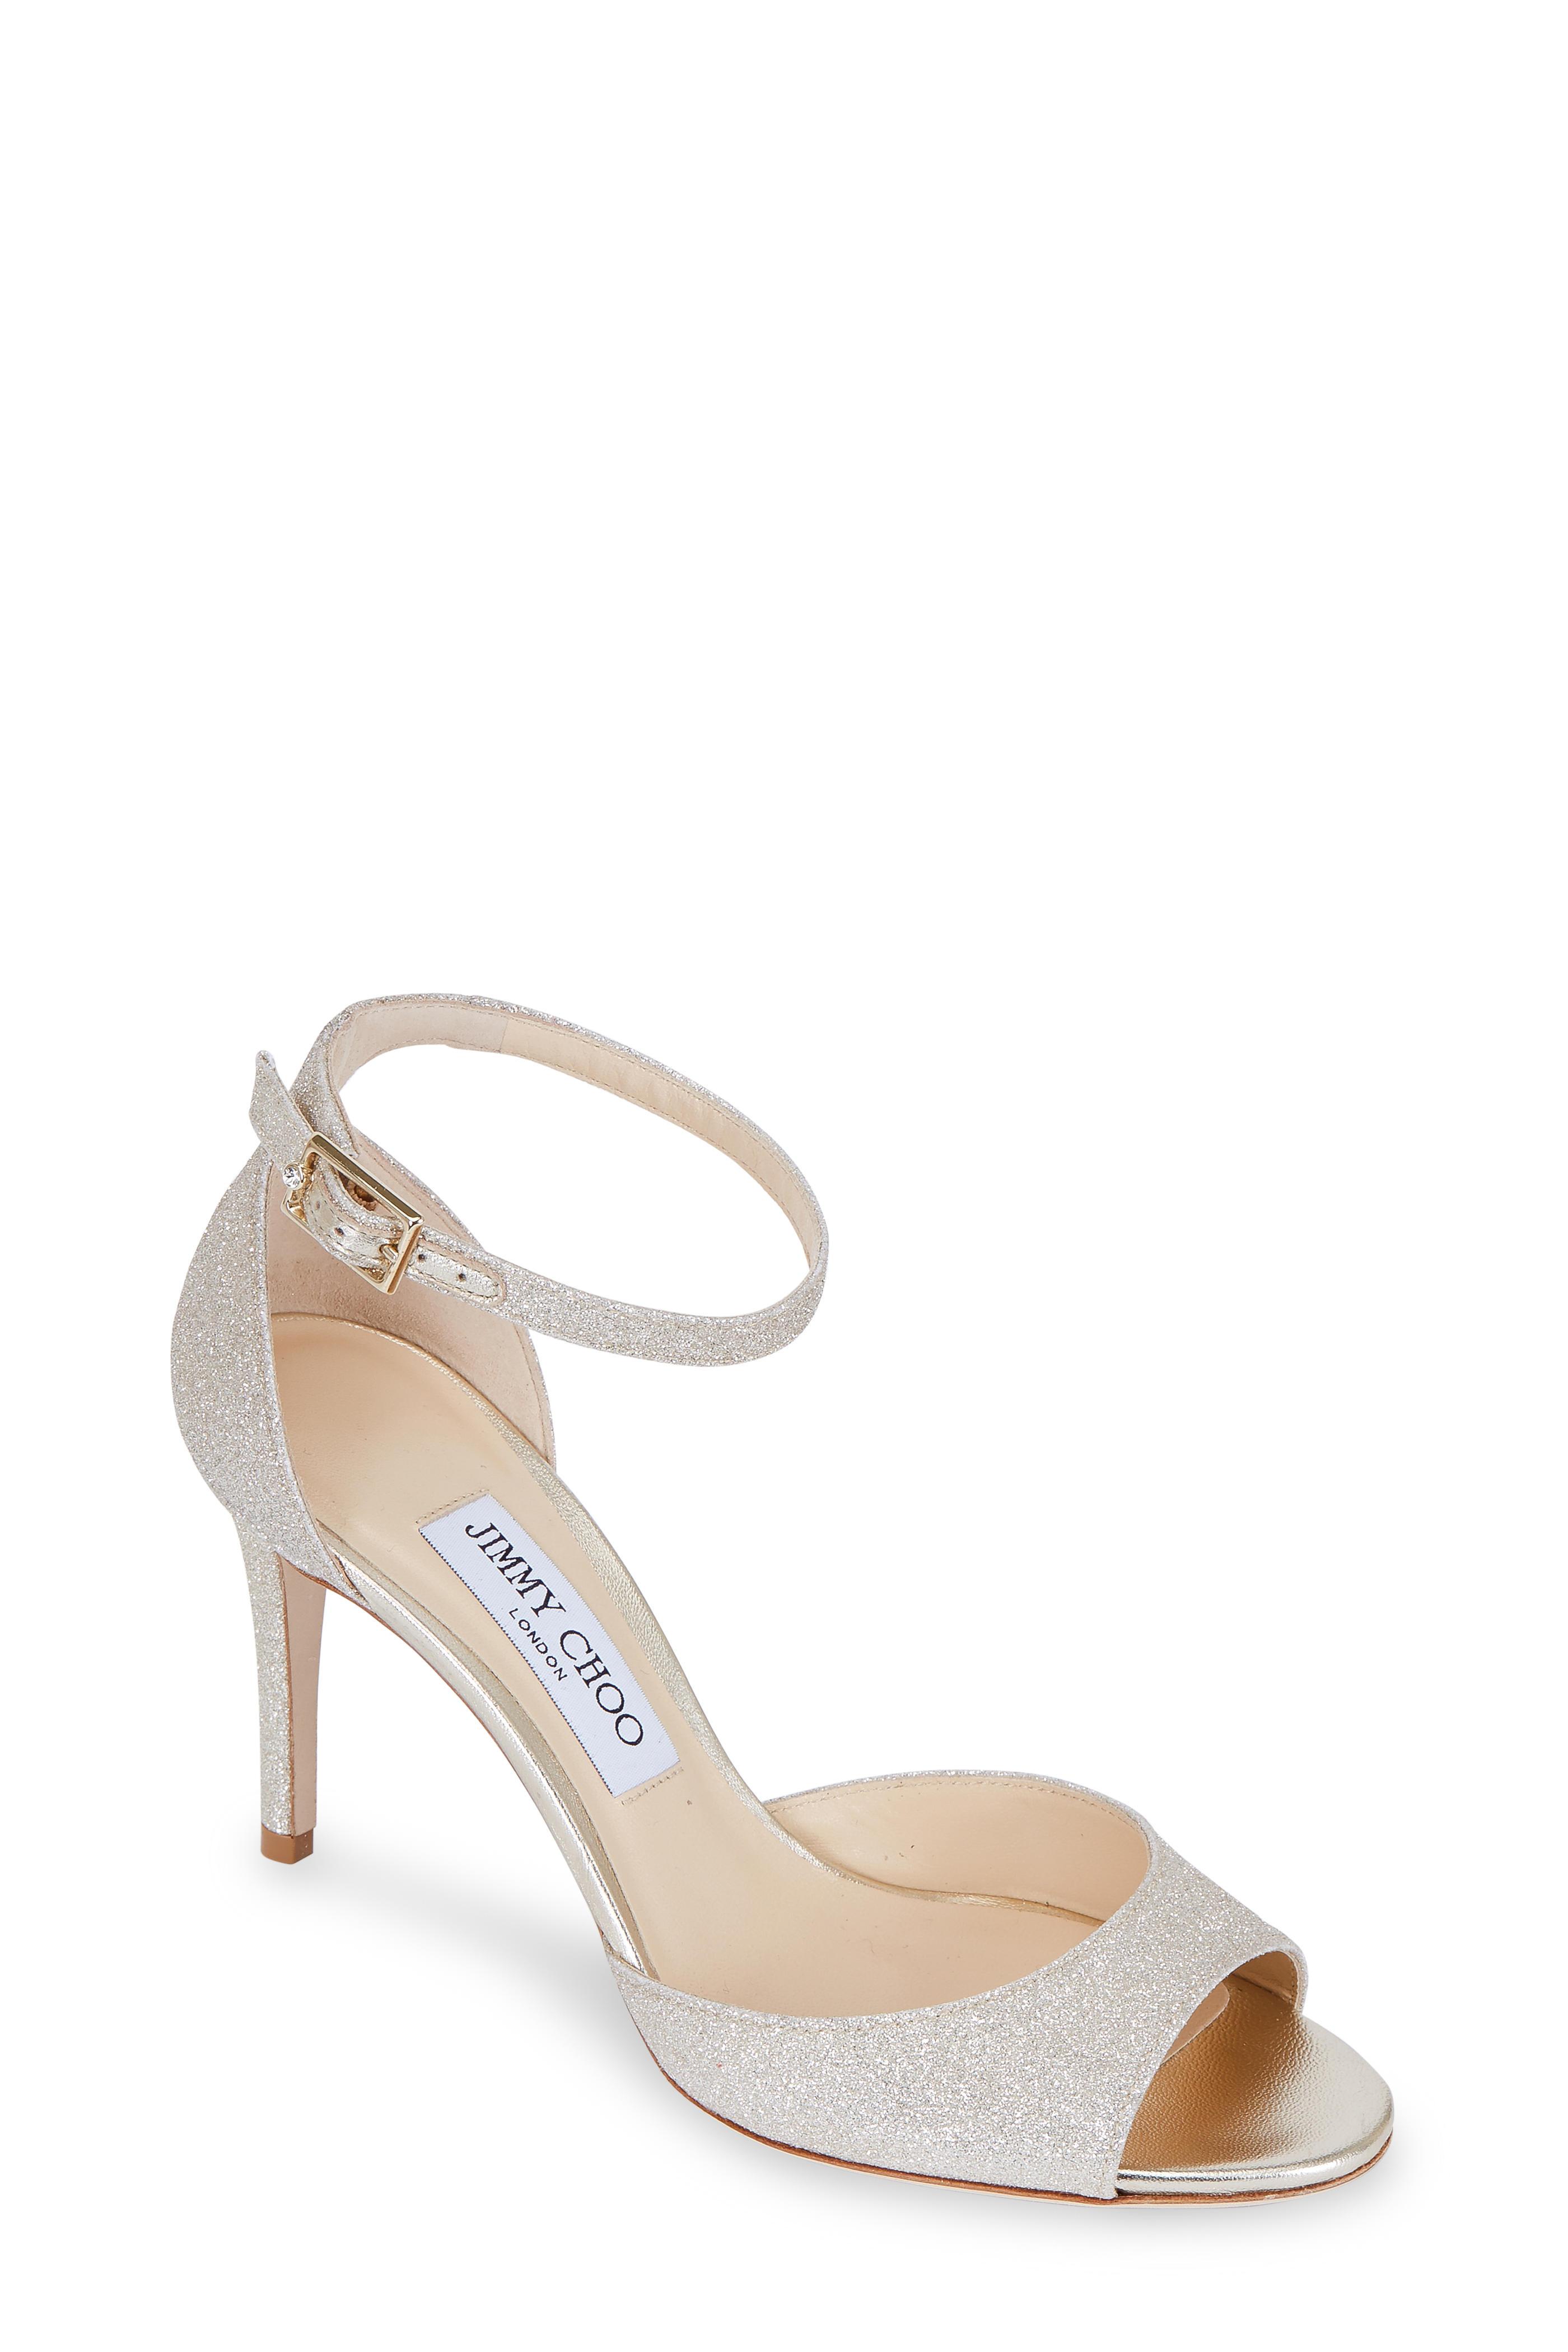 635da29c95b5 Jimmy Choo - Annie Platinum Glitter Ankle Strap Sandal